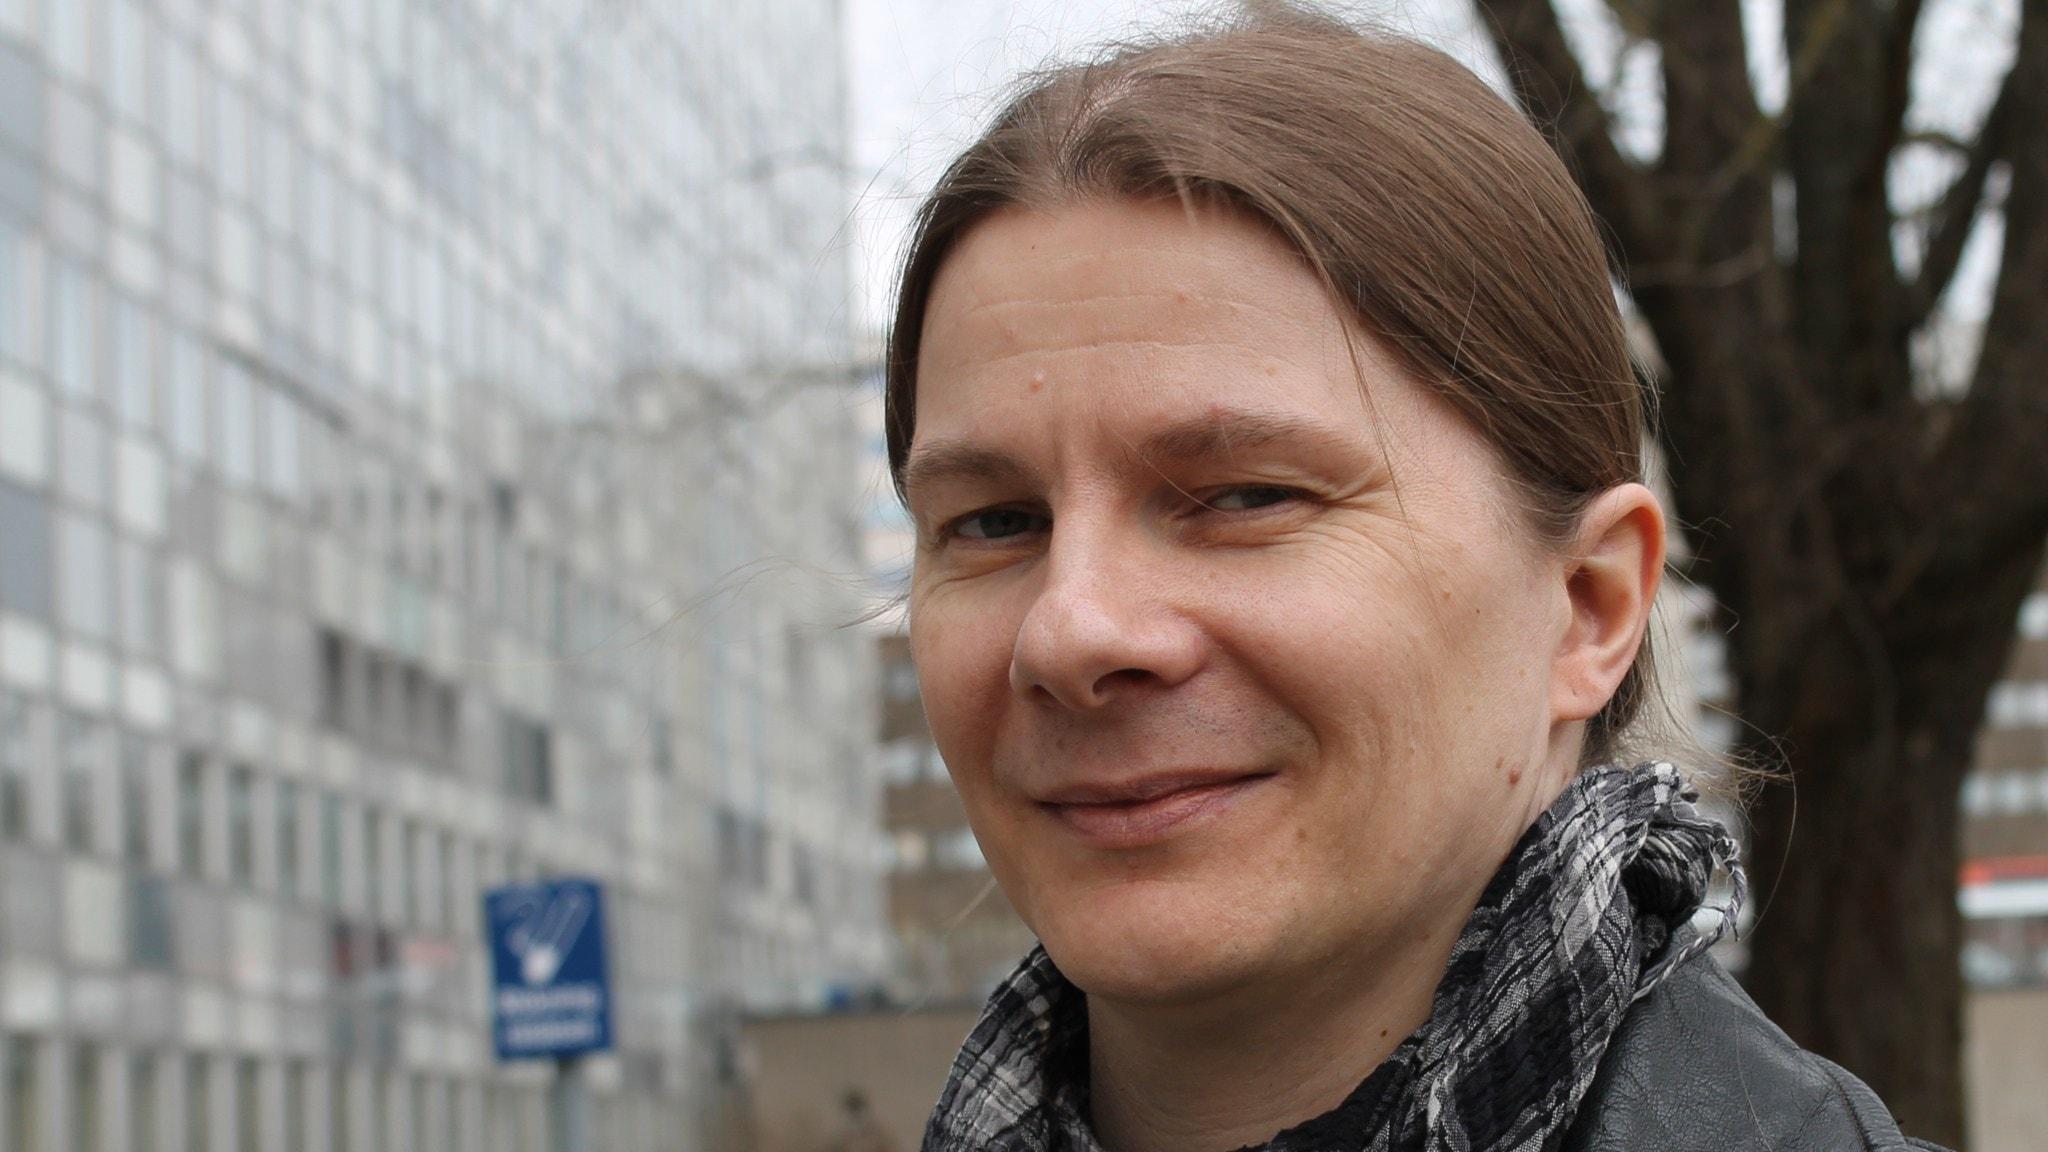 Johan Niskanen kitaran kielellä